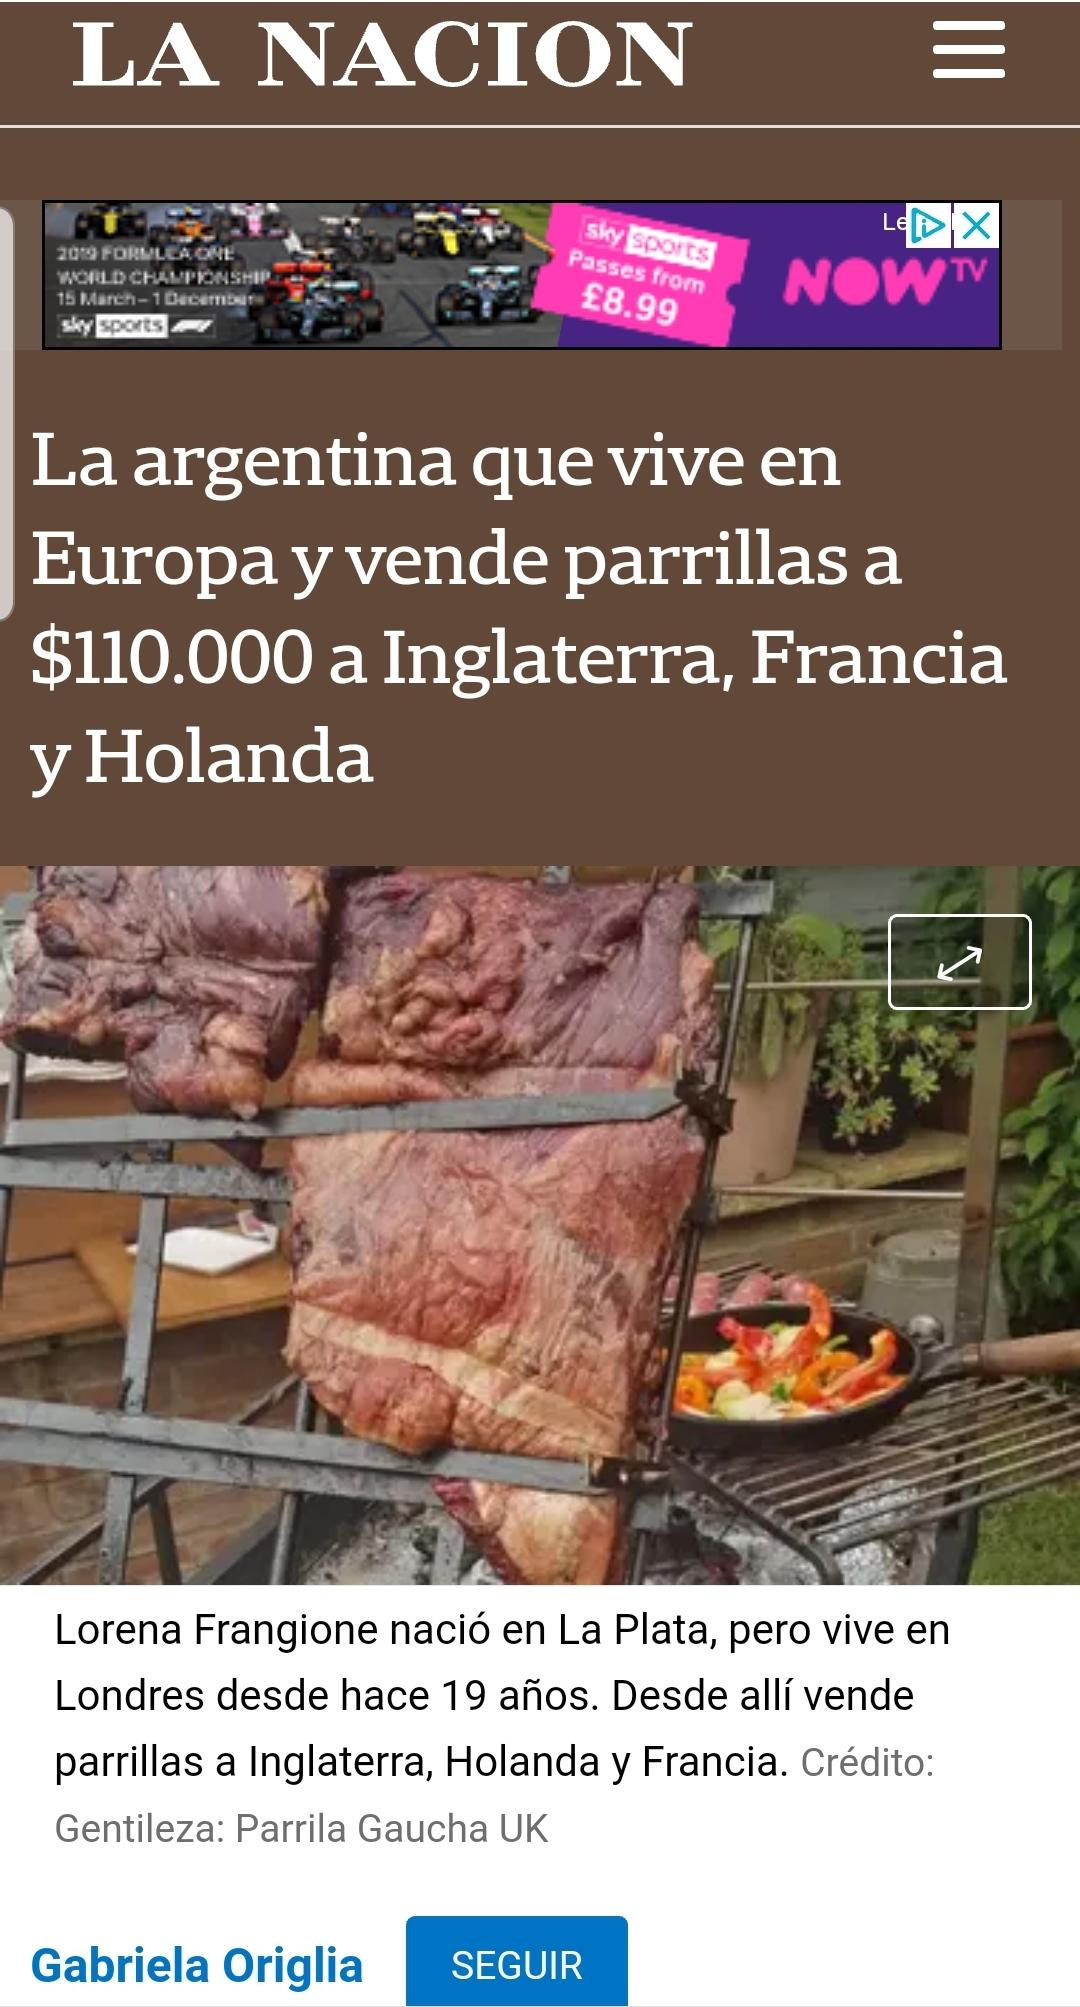 La Nacion Newspaper,Argentina April 2019 - Written by Gabriela Origliahttps://www.lanacion.com.ar/economia/la-argentina-vive-europa-vende-parrillas-110000-nid2239791